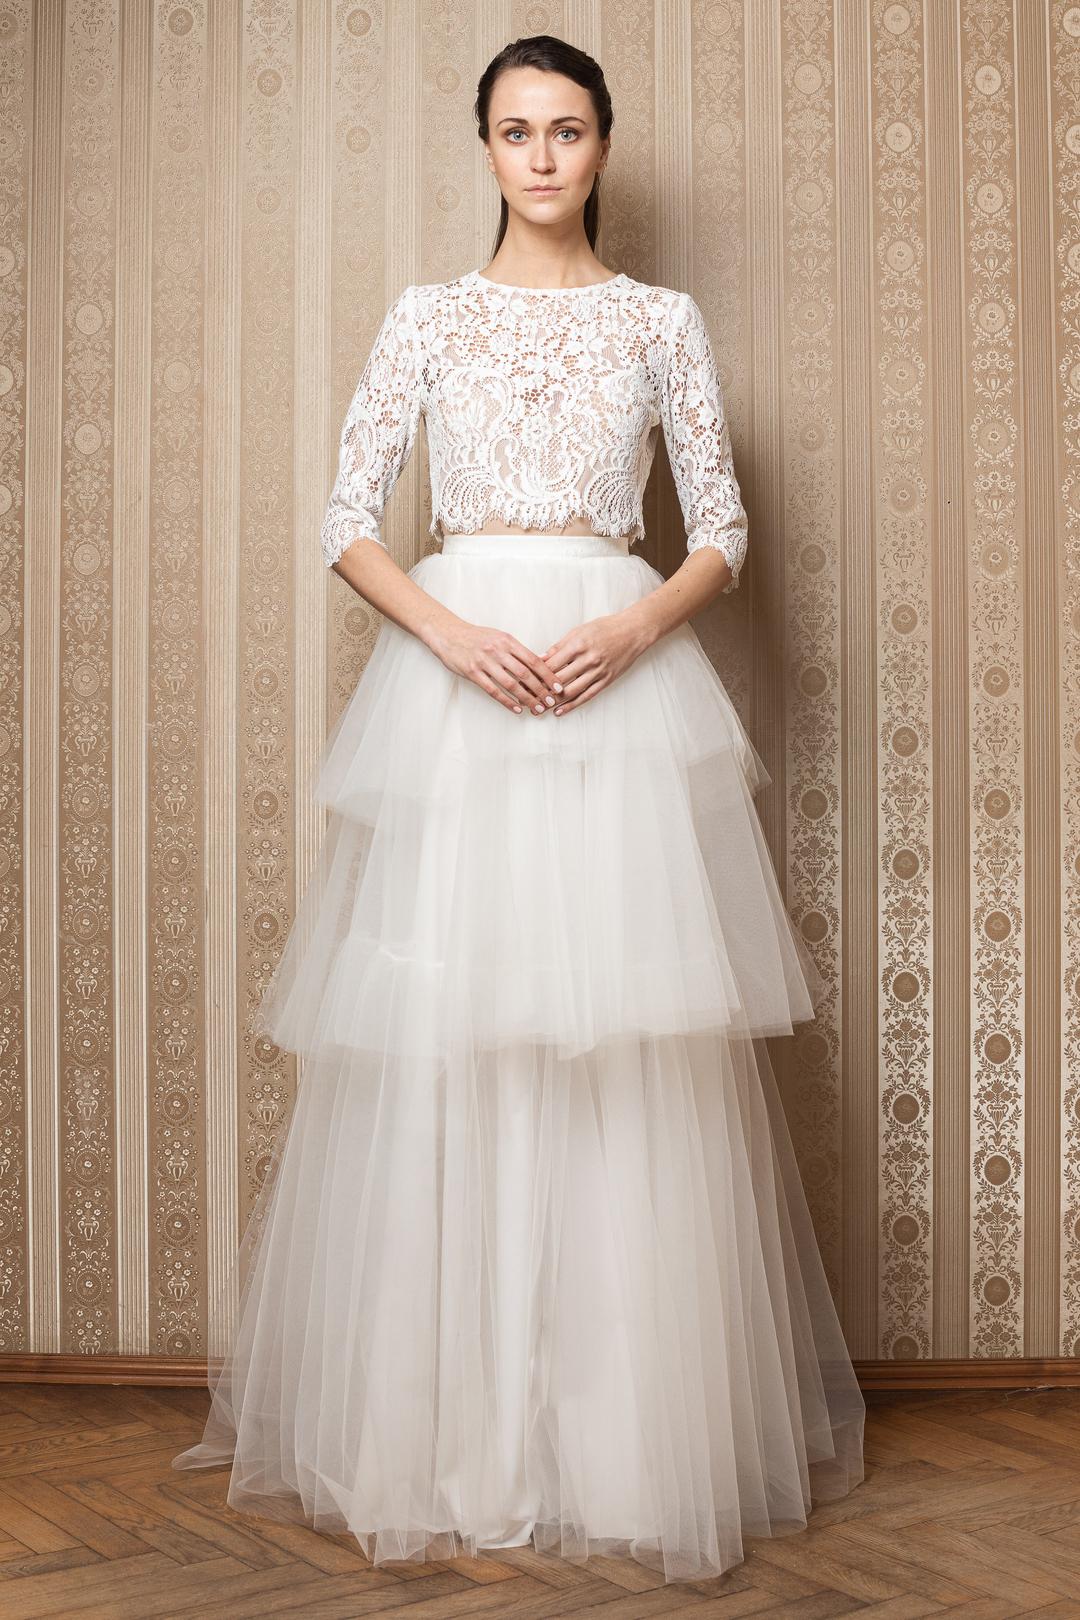 anise top / cinnamon skirt dress photo